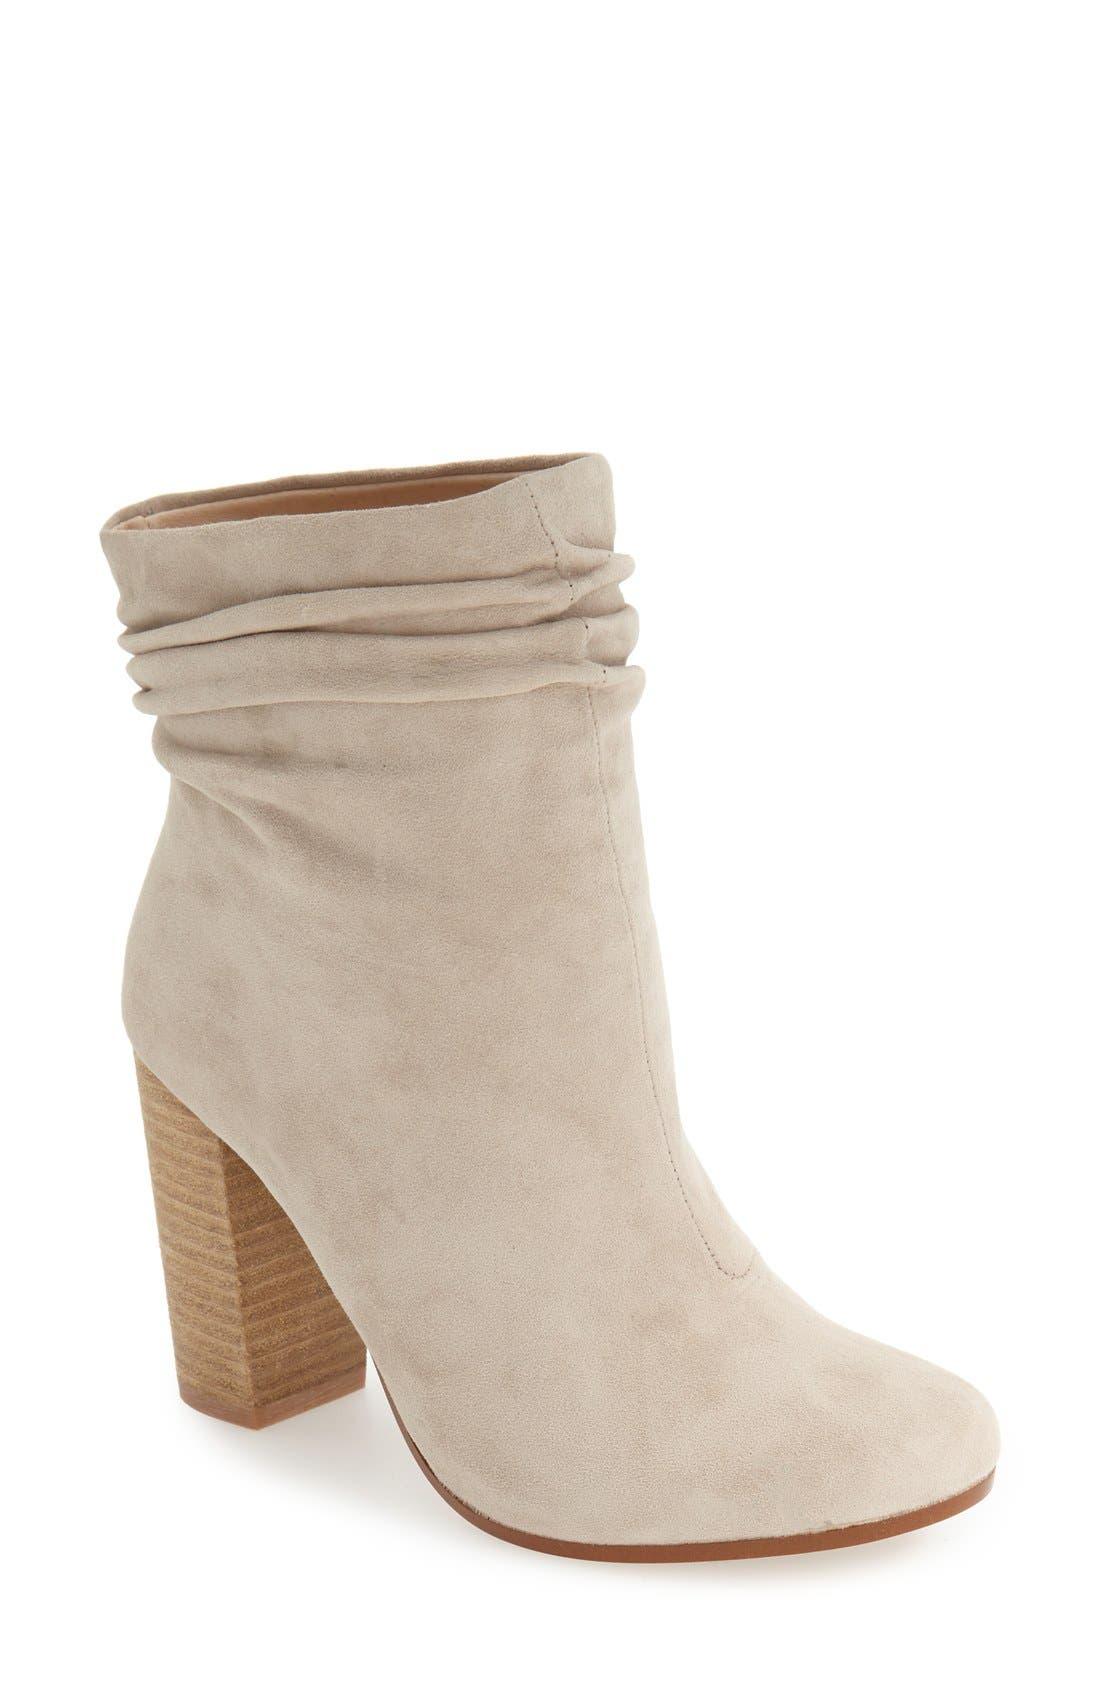 Alternate Image 1 Selected - Kristin Cavallari 'Georgie' Block Heel Boot (Women)